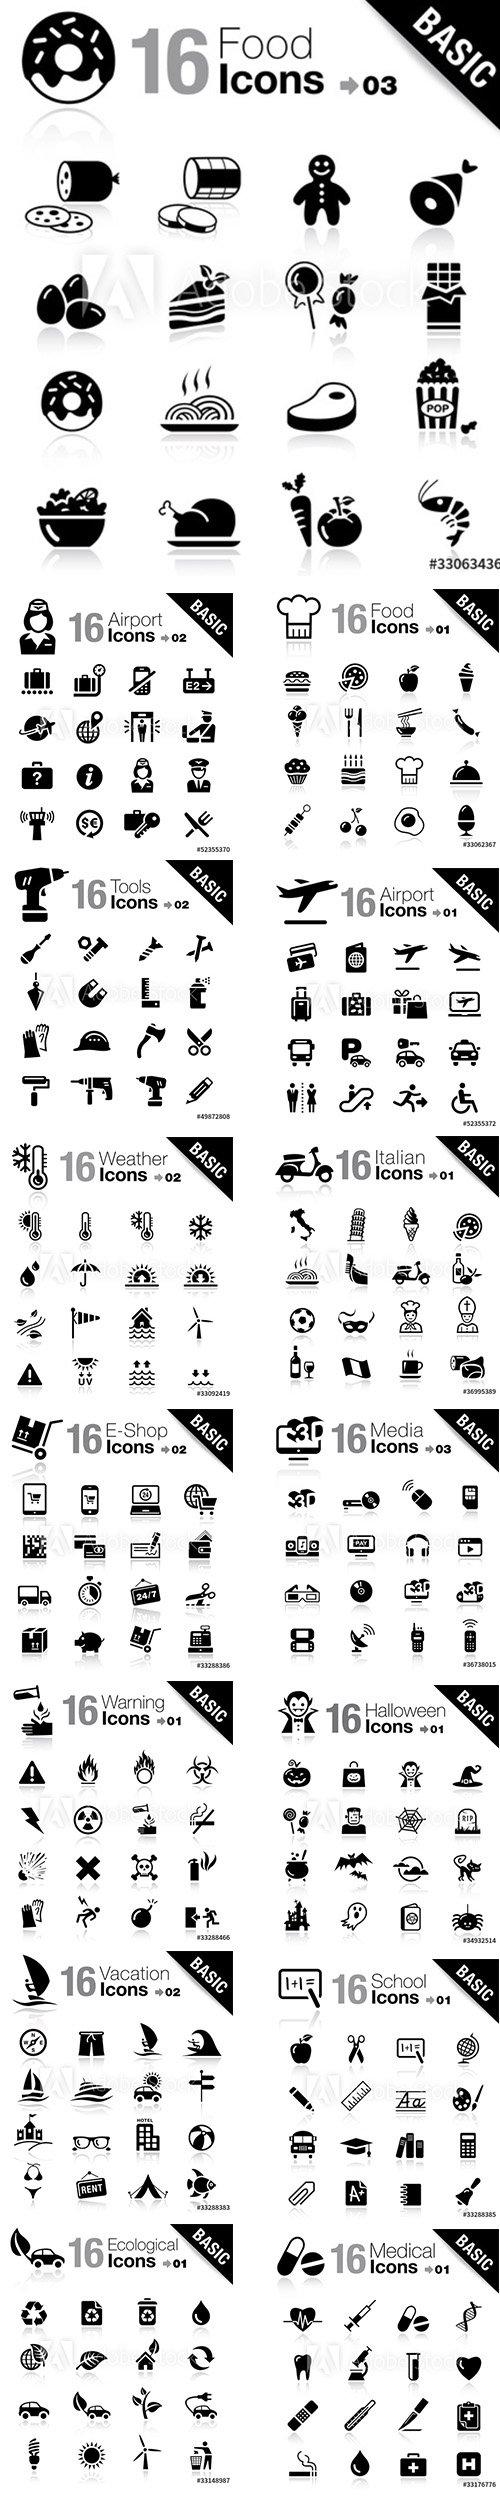 Basic Icons Pack Vol3